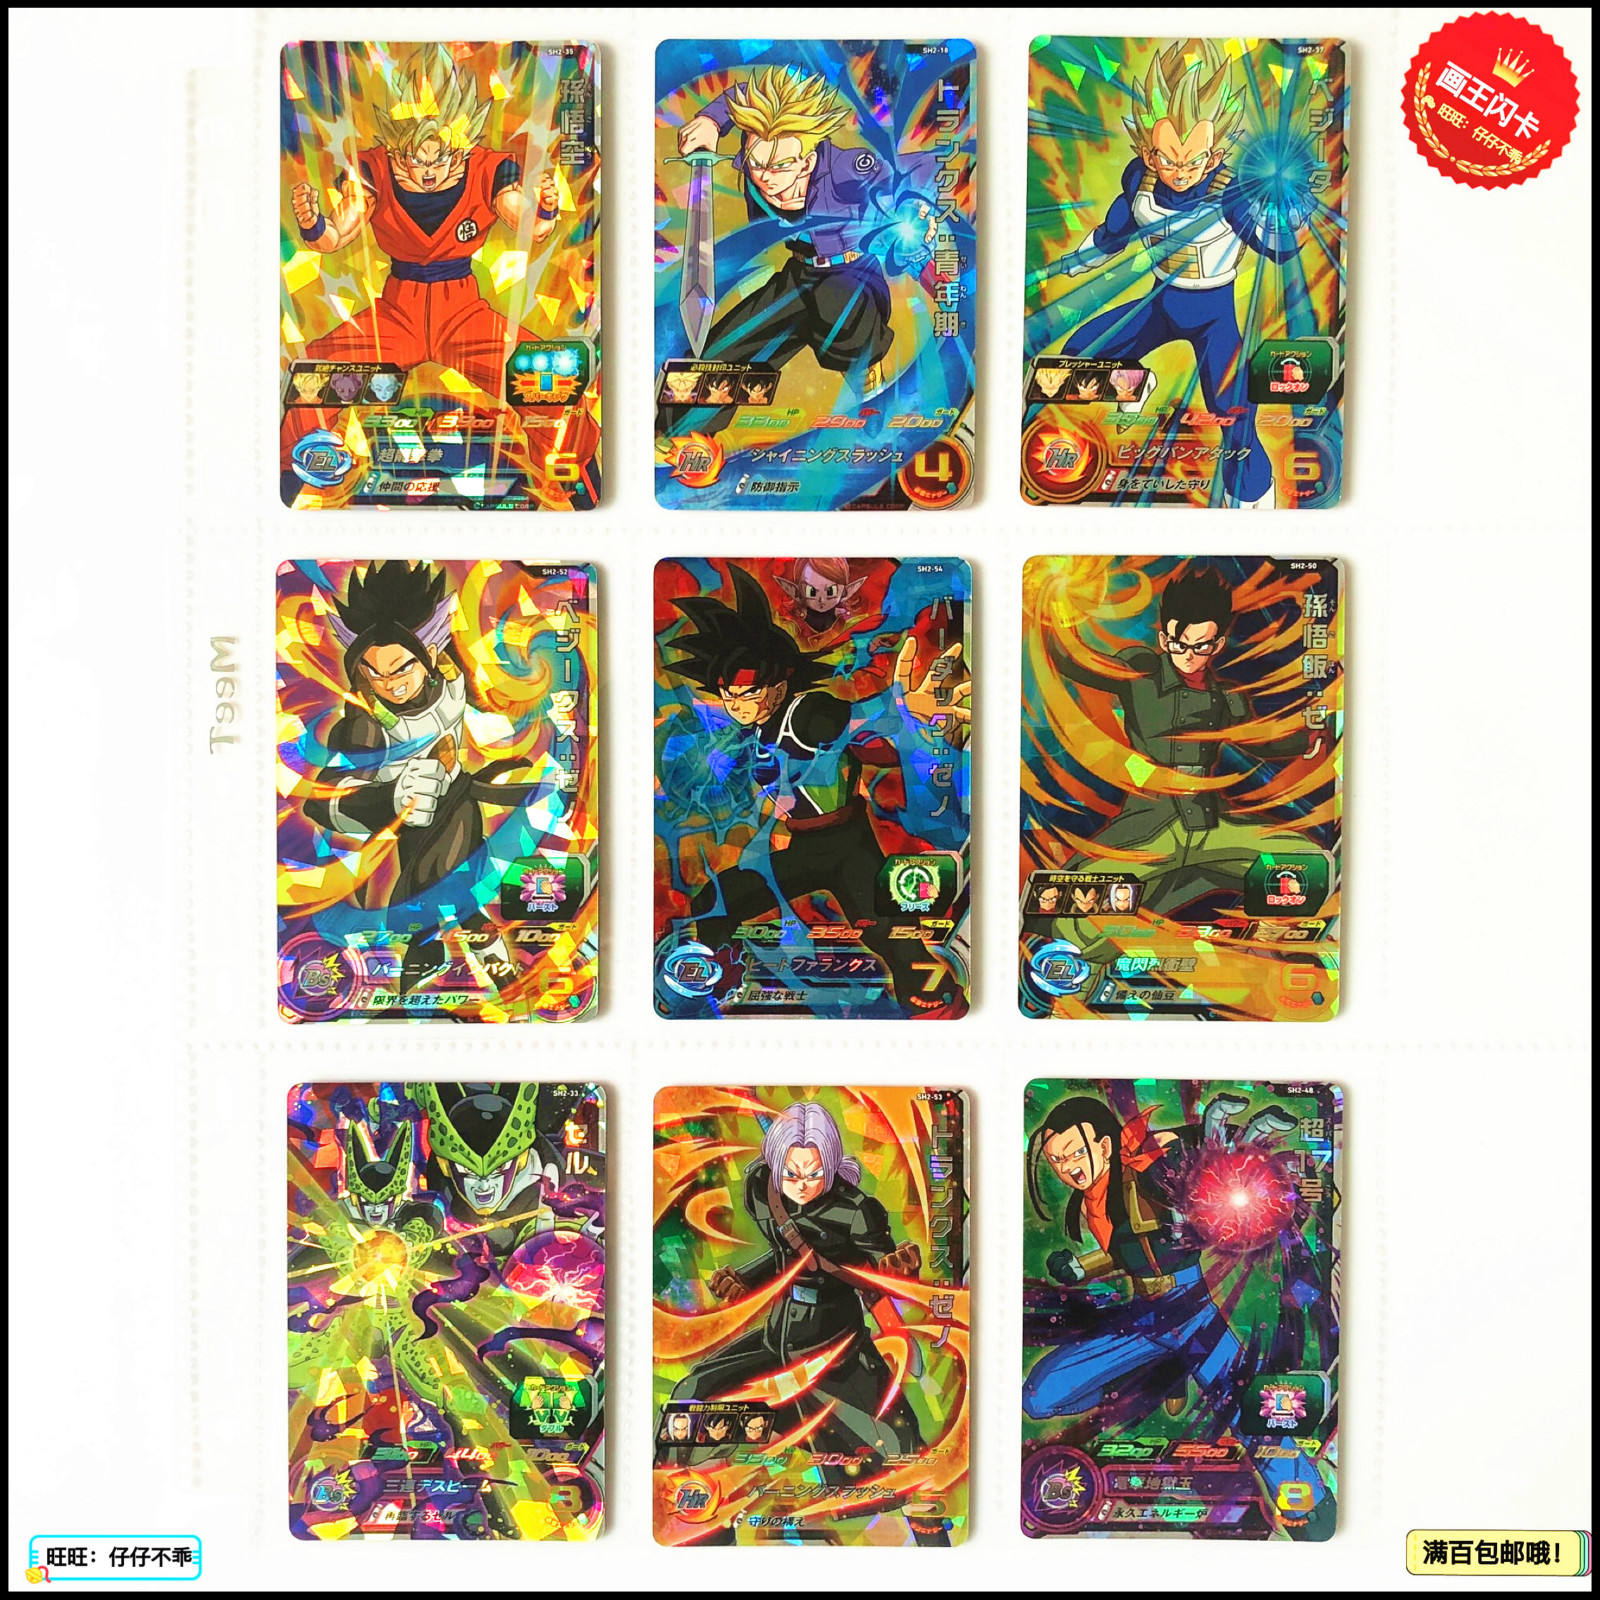 Japan Original Dragon Ball Hero SH2 SR God Super Saiyan Goku Toys Hobbies Collectibles Game Collection Anime Cards